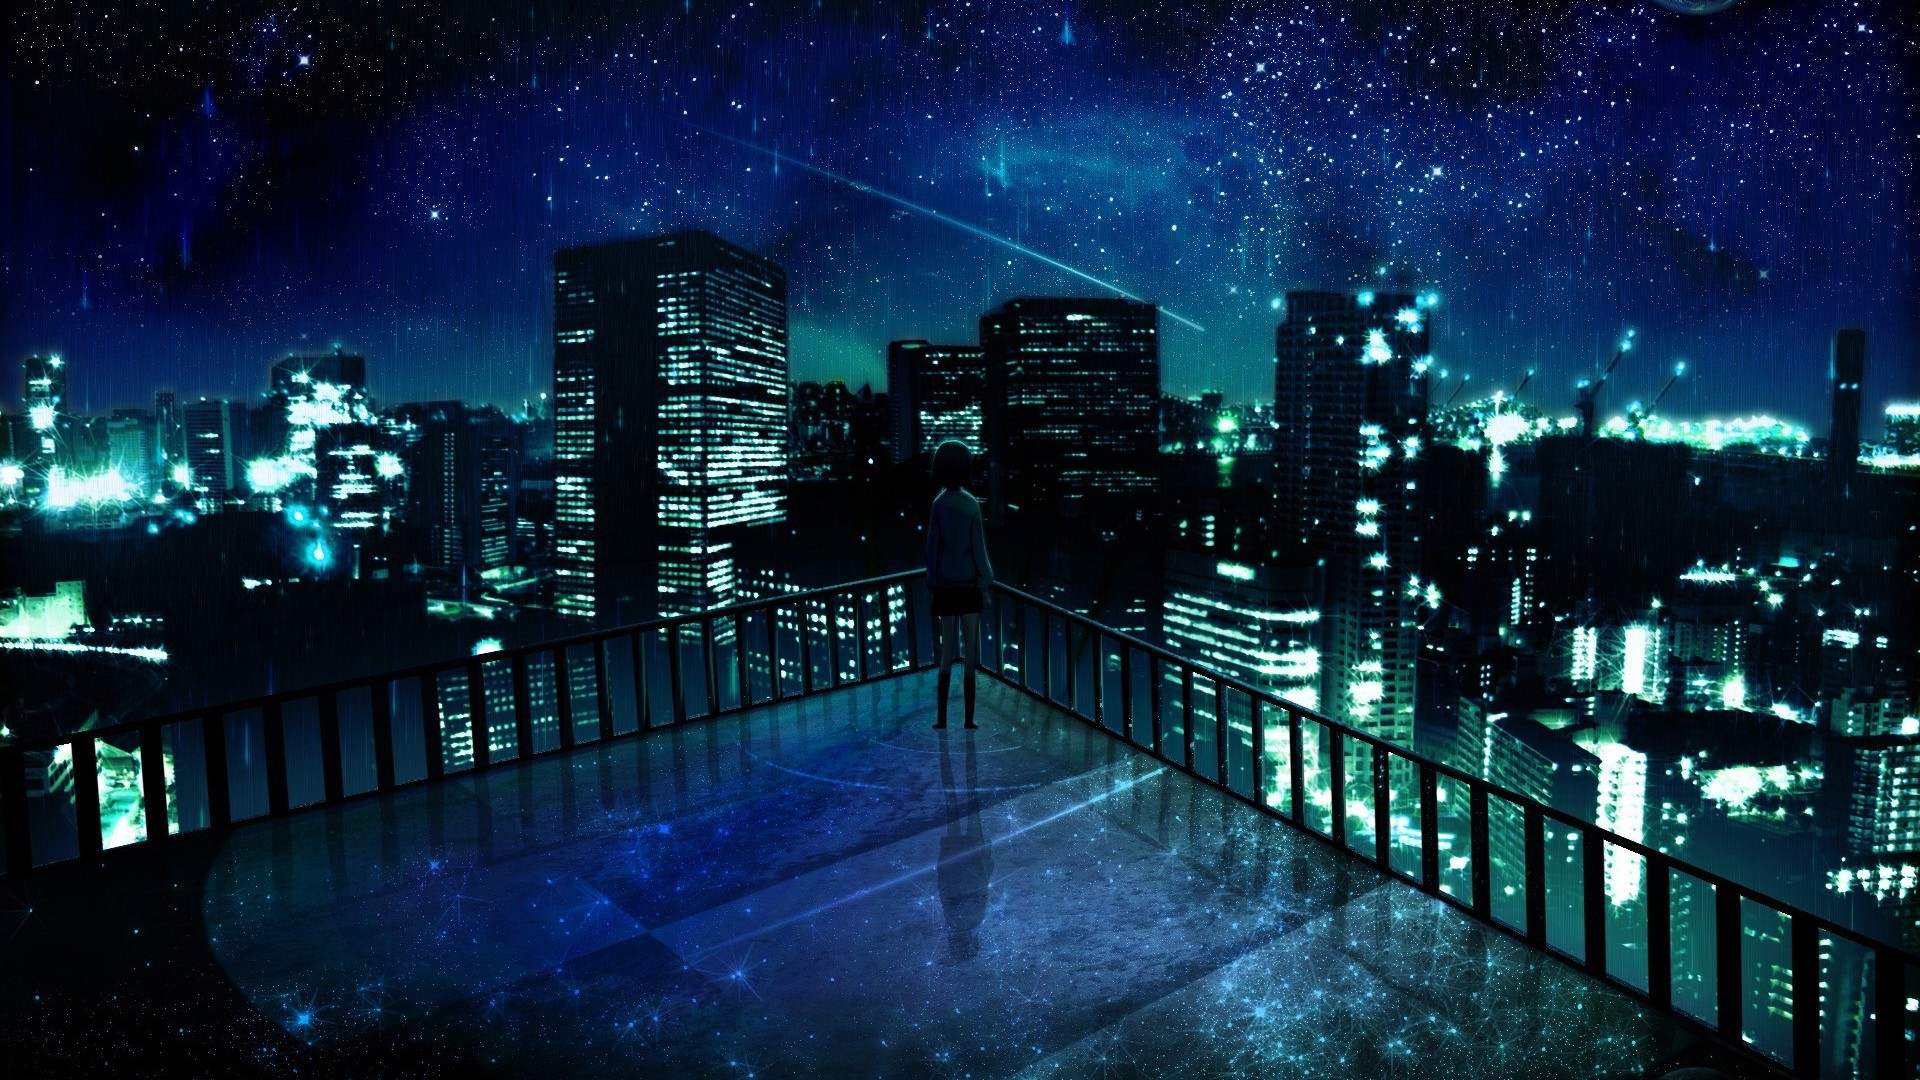 City Wallpaper Dark Anime Background Scenery 1920x1080 Download Hd Wallpaper Wallpapertip